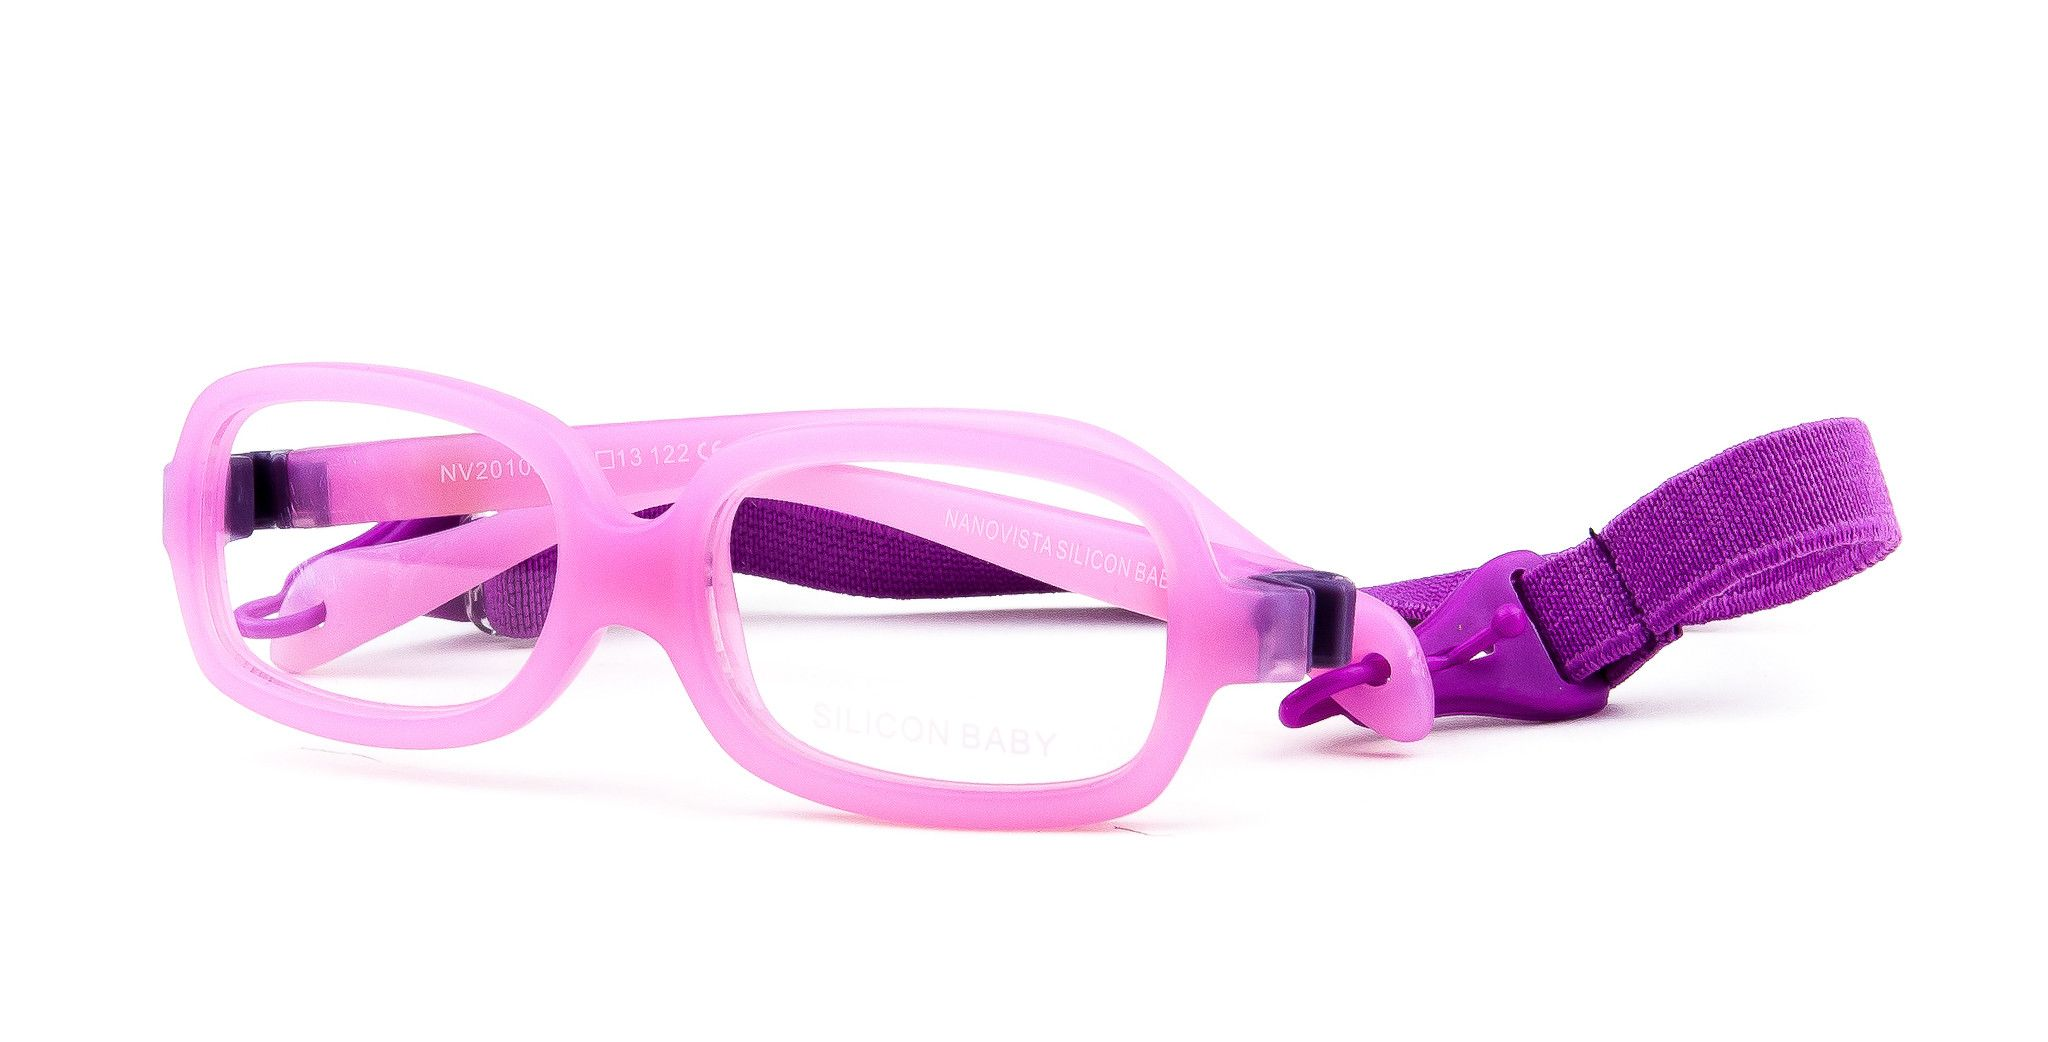 Nanovista Silicon Baby Pink  #kidsglasses #kidseyewear #kidsprotectiveeyewear #kidsglasses #childrensglasses #nanovista